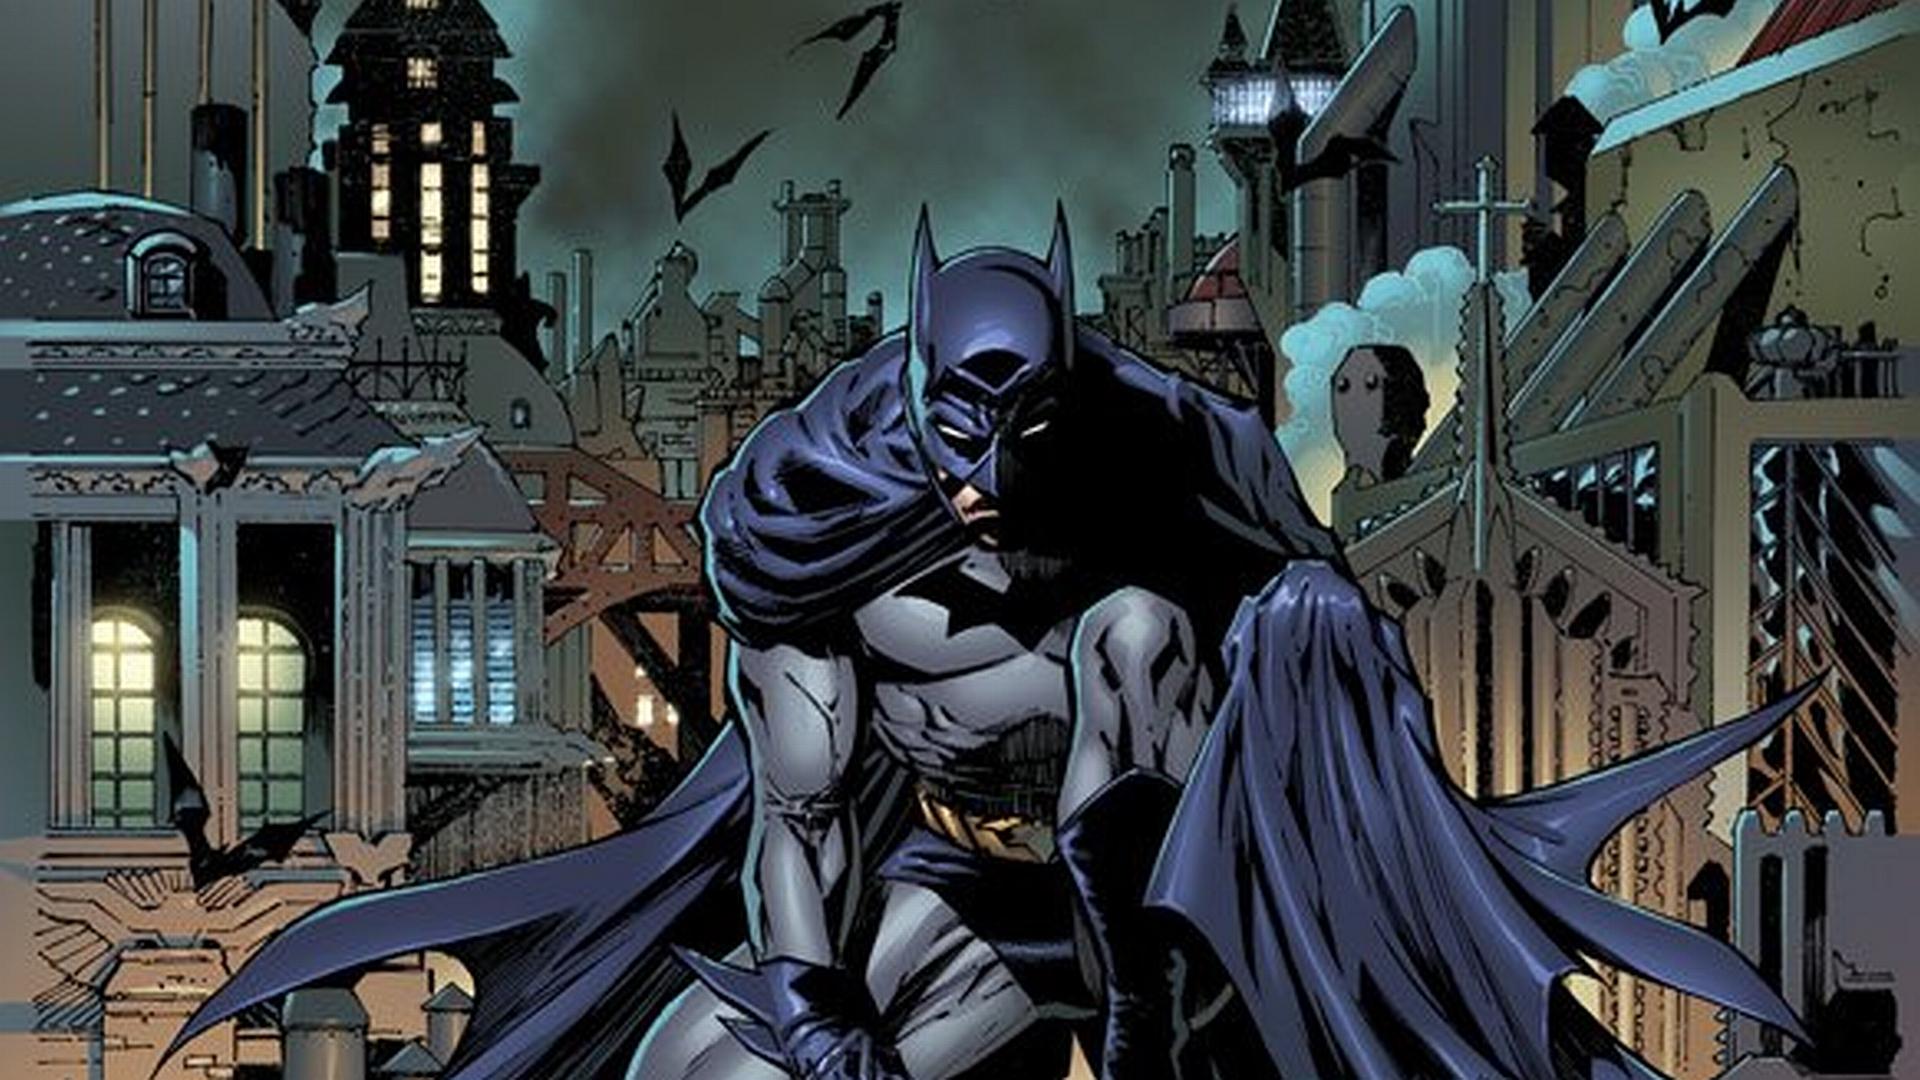 batman full hd wallpaper and background image | 1920x1080 | id:162793